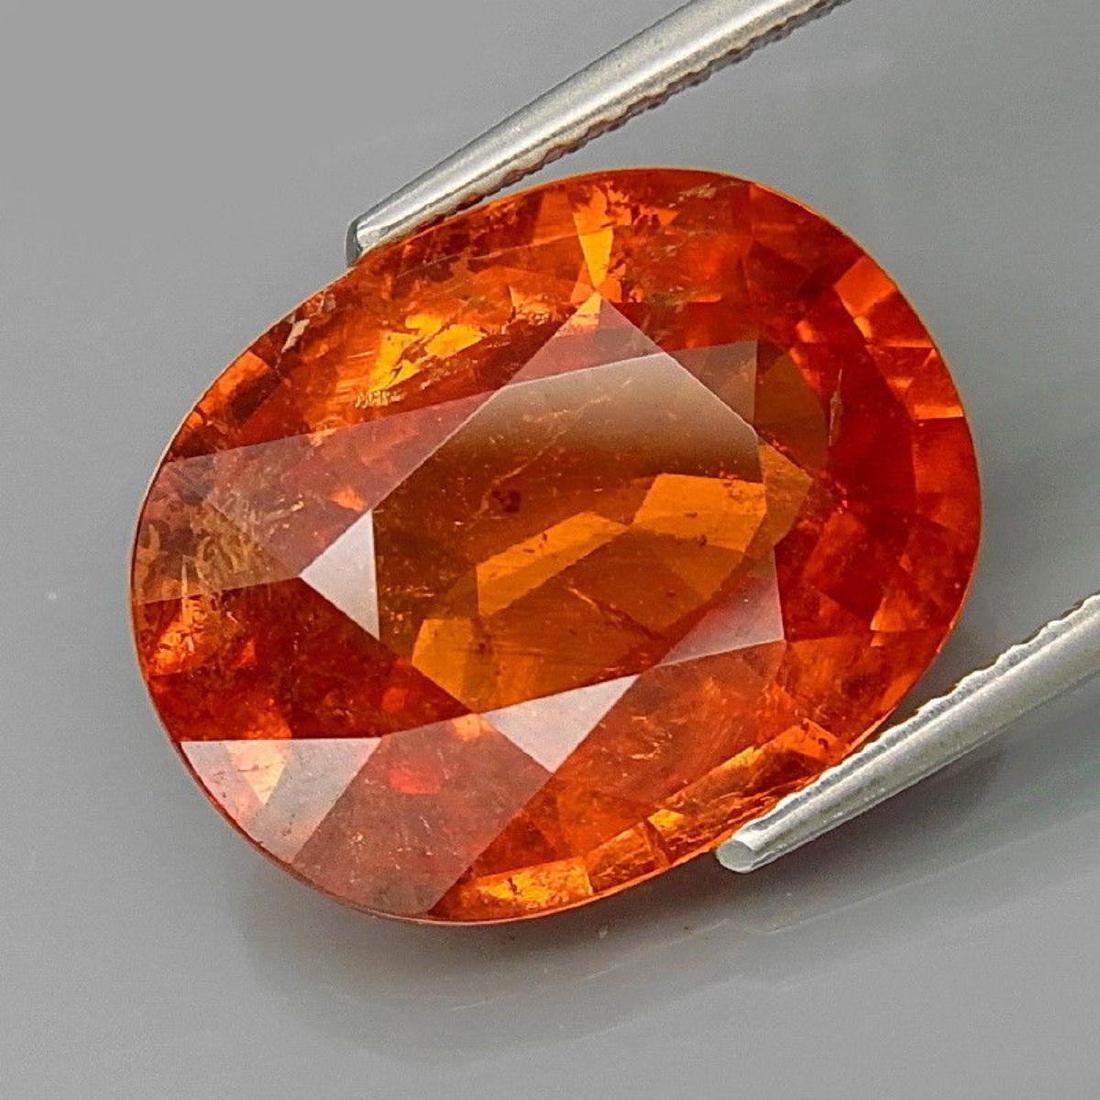 Mandarin Orange Namibian Spessartite Garnet 11.87 CT